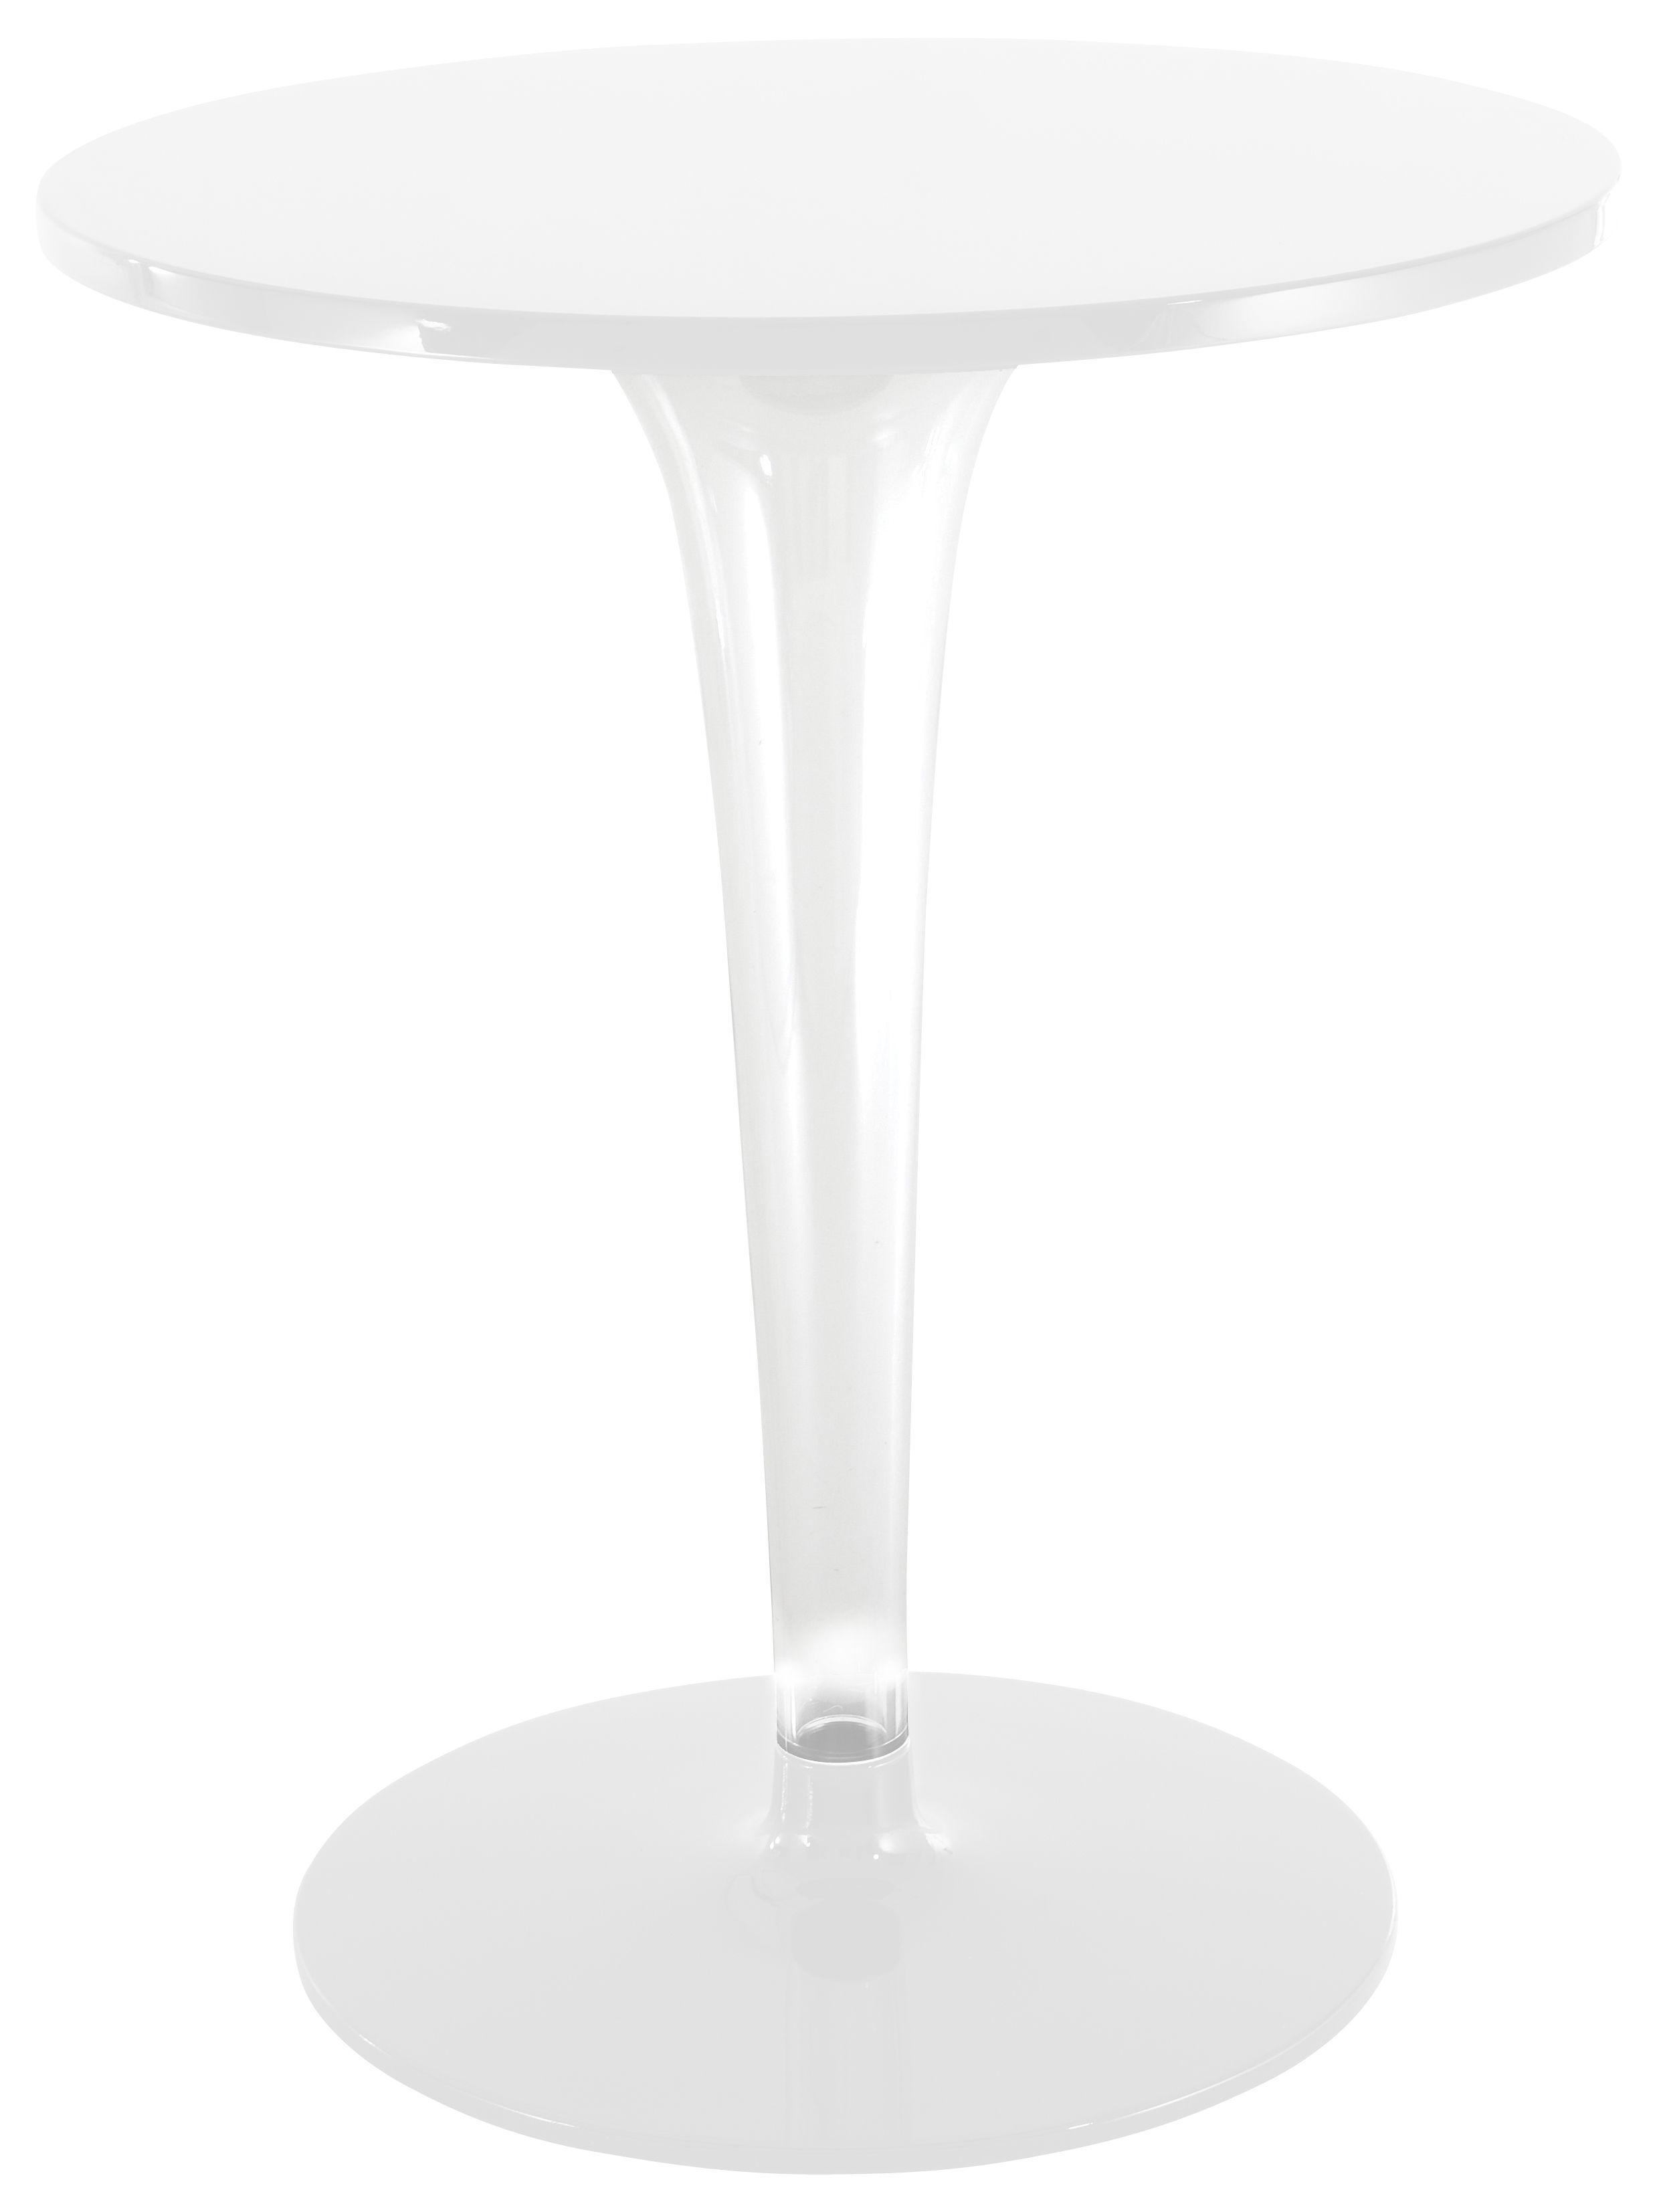 Jardin - Tables de jardin - Table de jardin TopTop - Dr. YES / Ø 60 cm - Kartell - Ø 60 cm - Blanc / base et pied ronds - Aluminium verni, Mélamine, PMMA